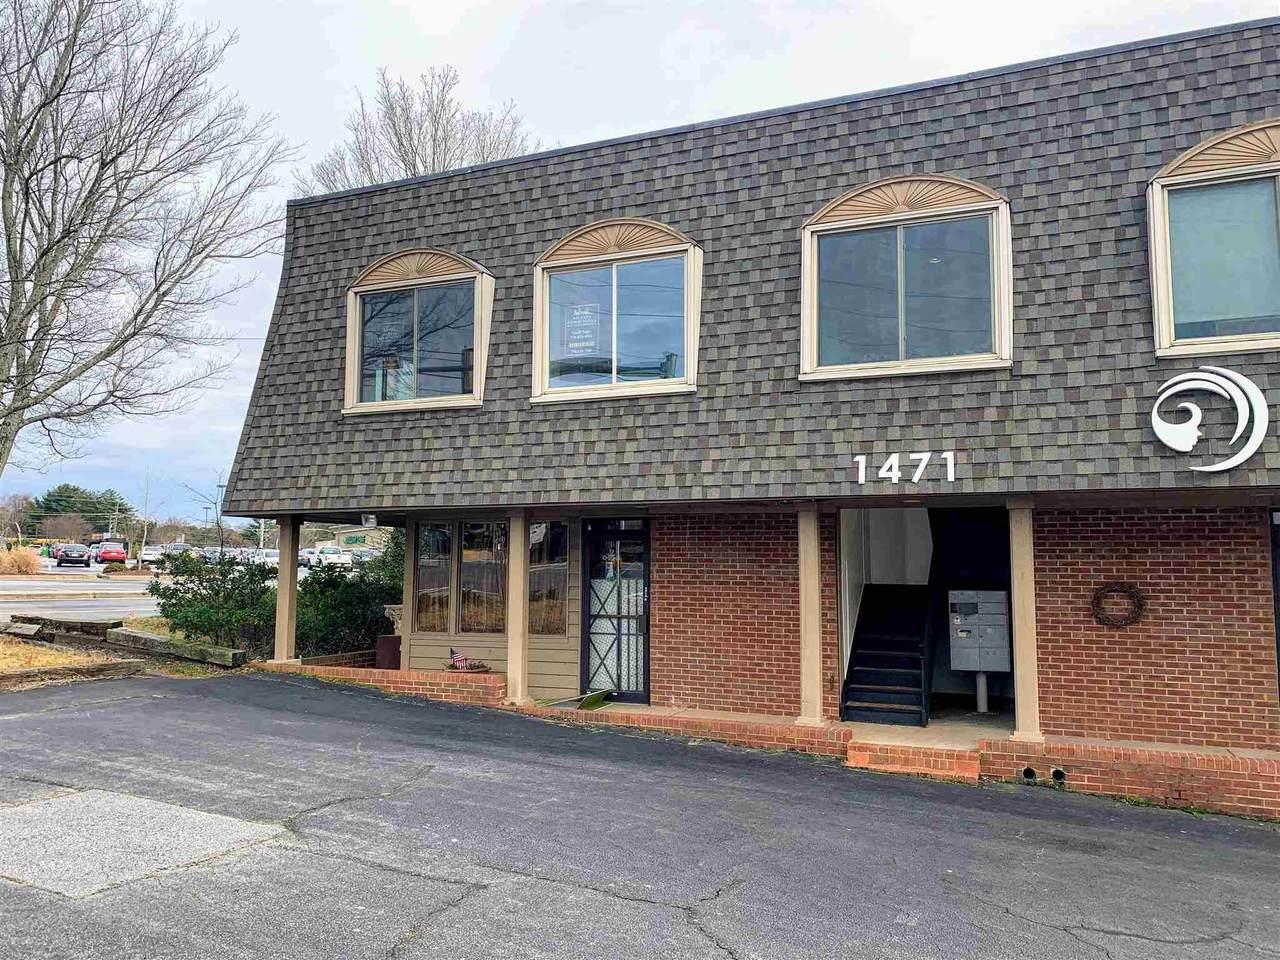 1471 Terrell Mill Rd - Photo 1